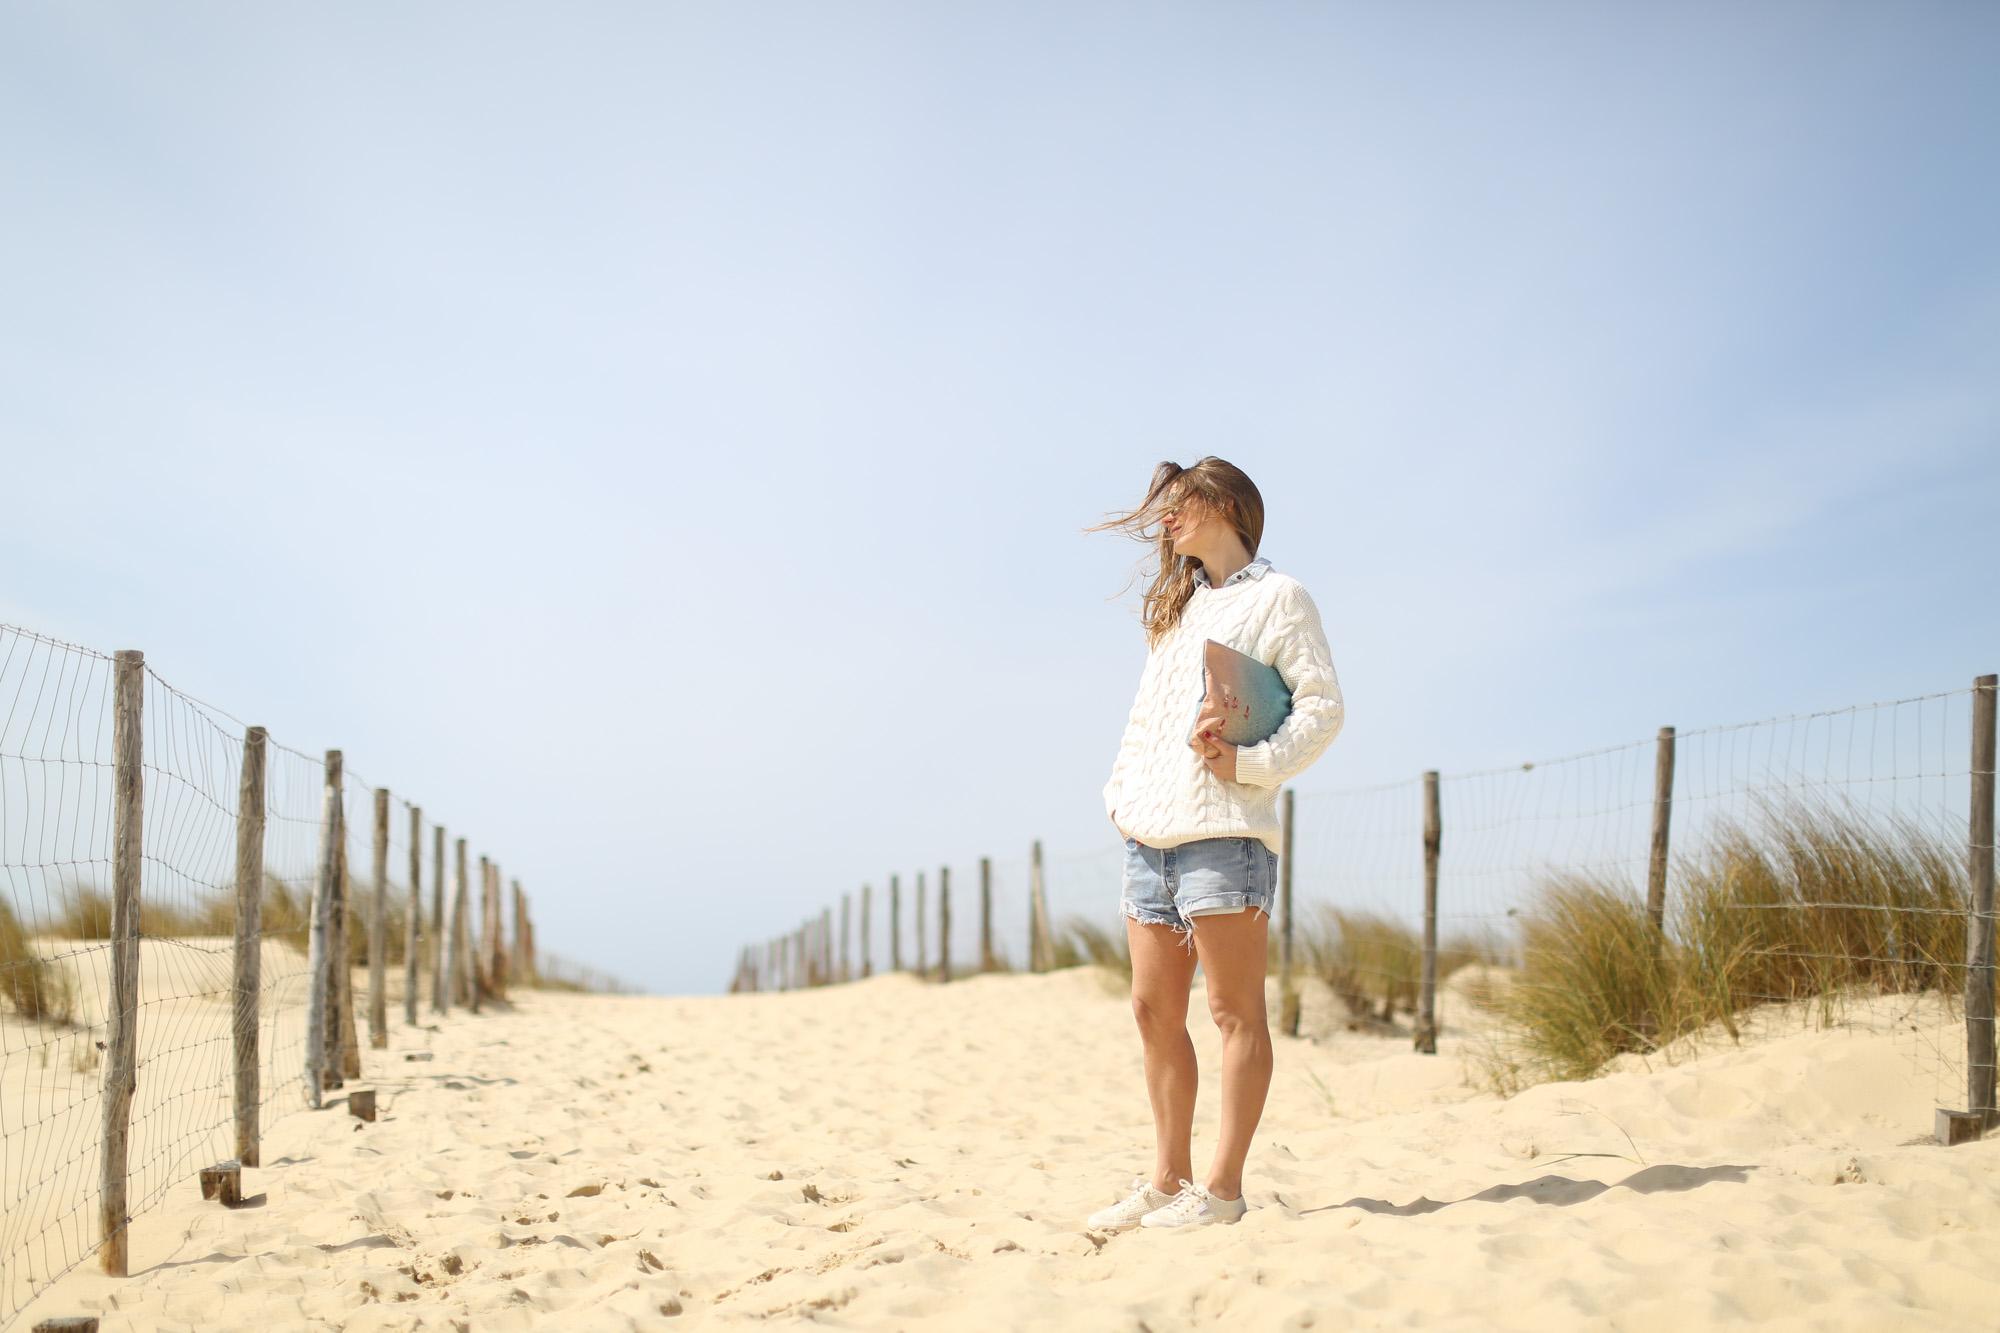 Clochet-streetstyle-levis-501-vintage-shorts-superga-crochet-thalatta-concept-bathers-pouch